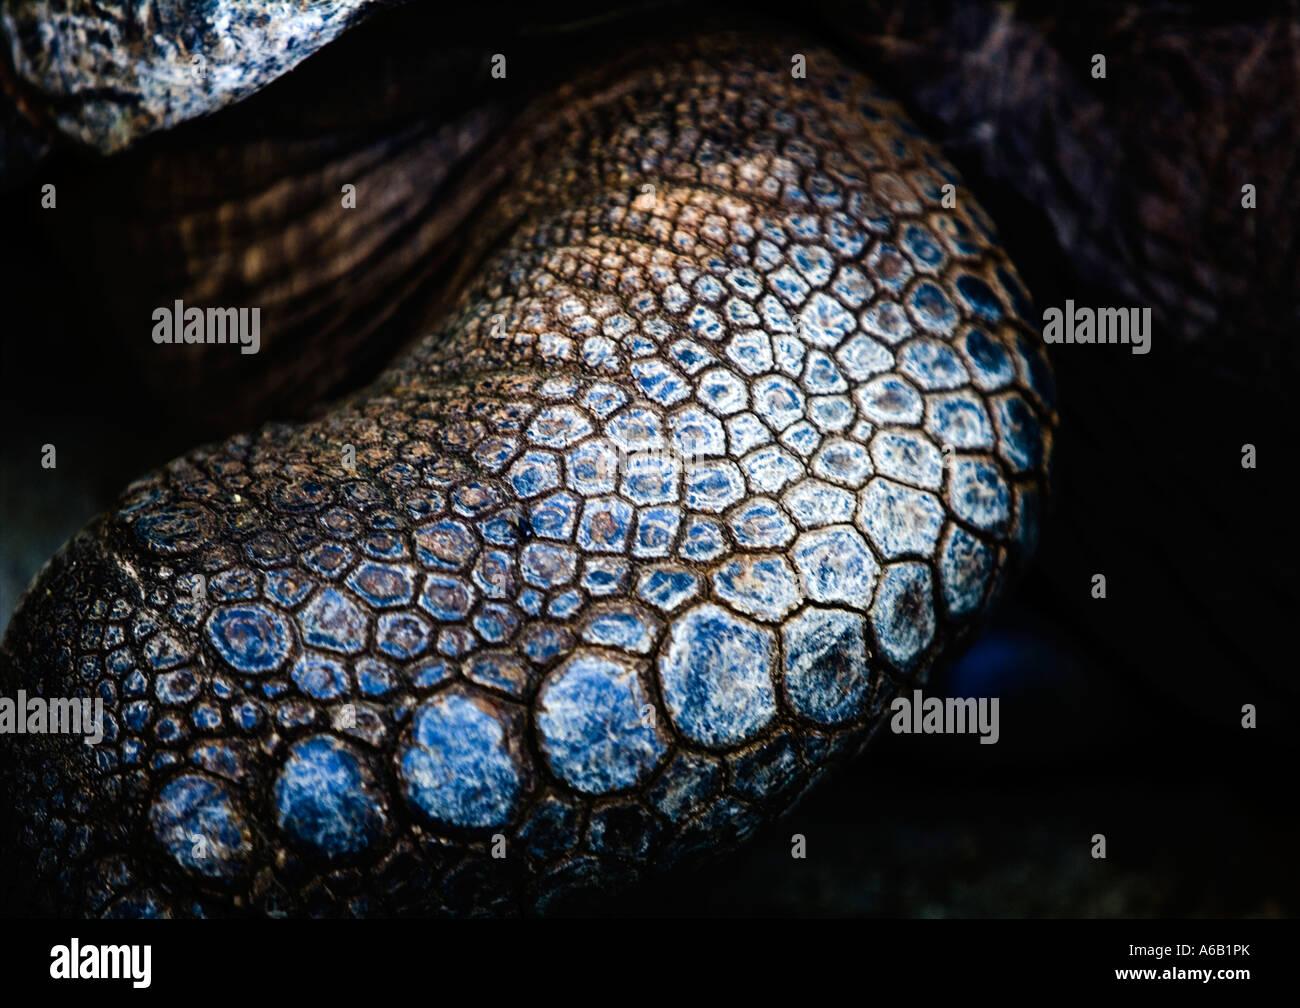 [Leg detail], of [Giant Tortoise] - 'Domaine Anna', near 'Flic en Flac', 'Mauritius' - Stock Image